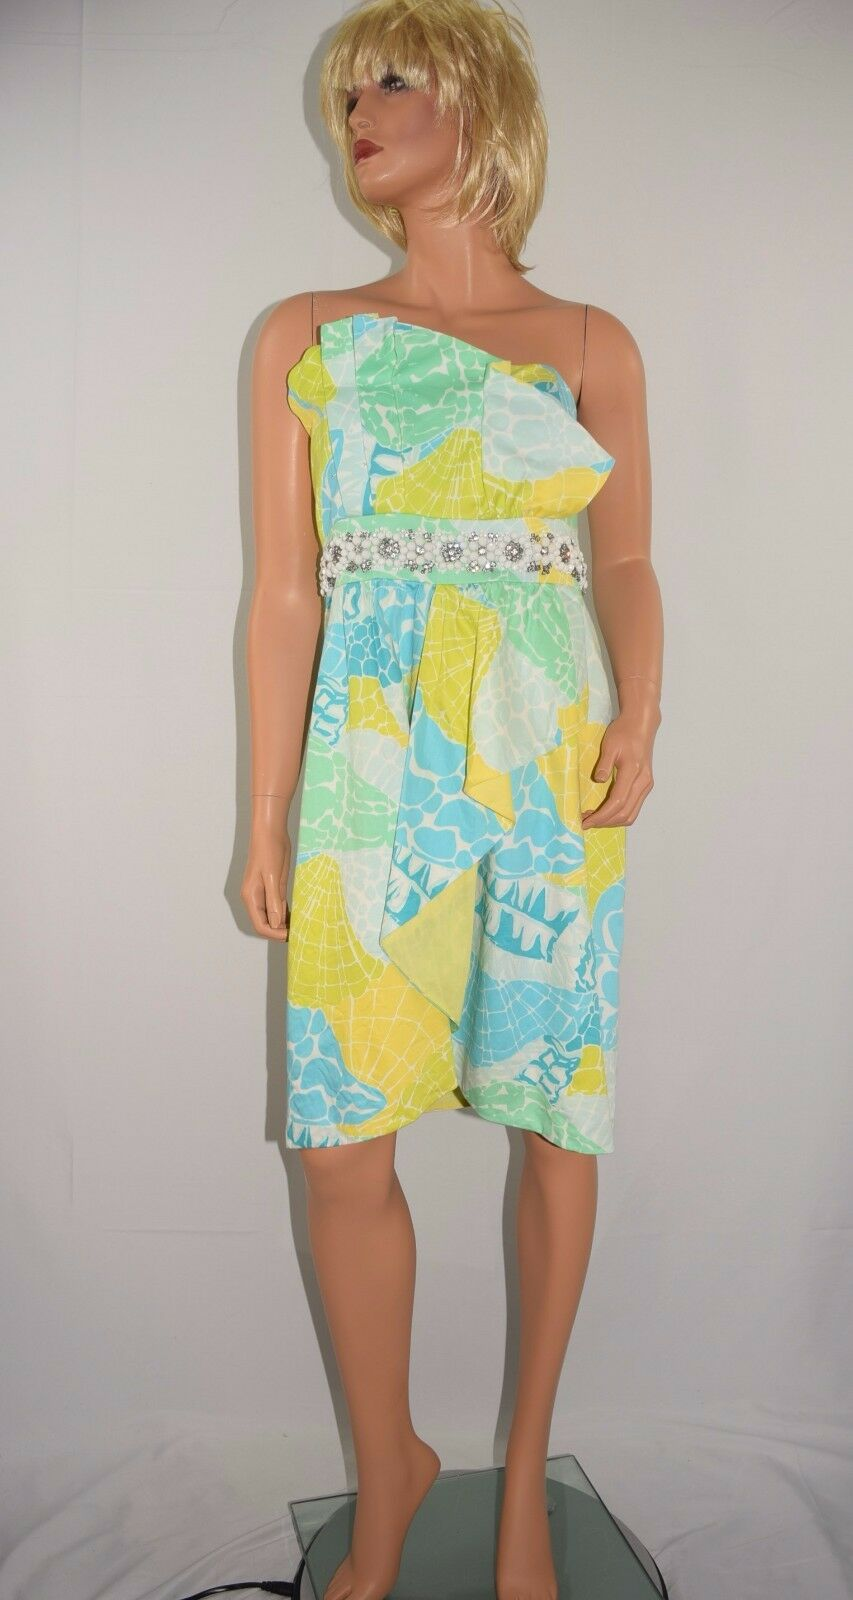 LILLY PULITZER Strapless 100% Cotton Pastel Sea Shell Print Bead Dress Größe 14